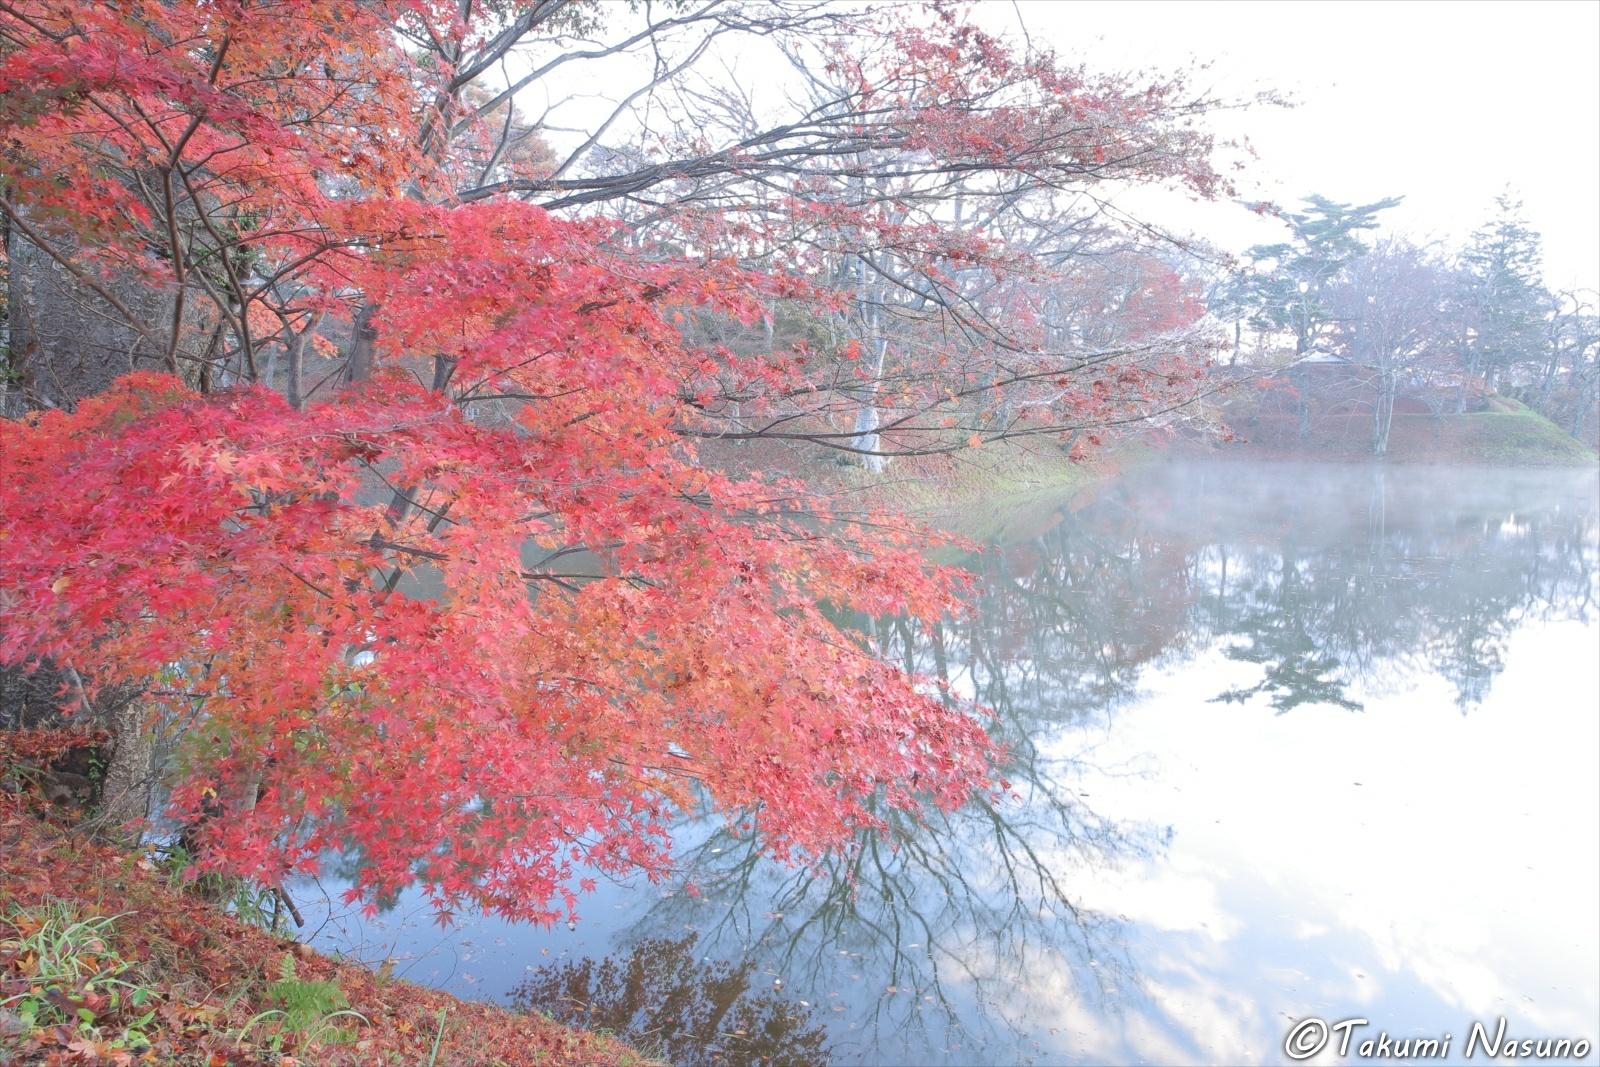 Autumn Colors and Site of Tanagura Castle